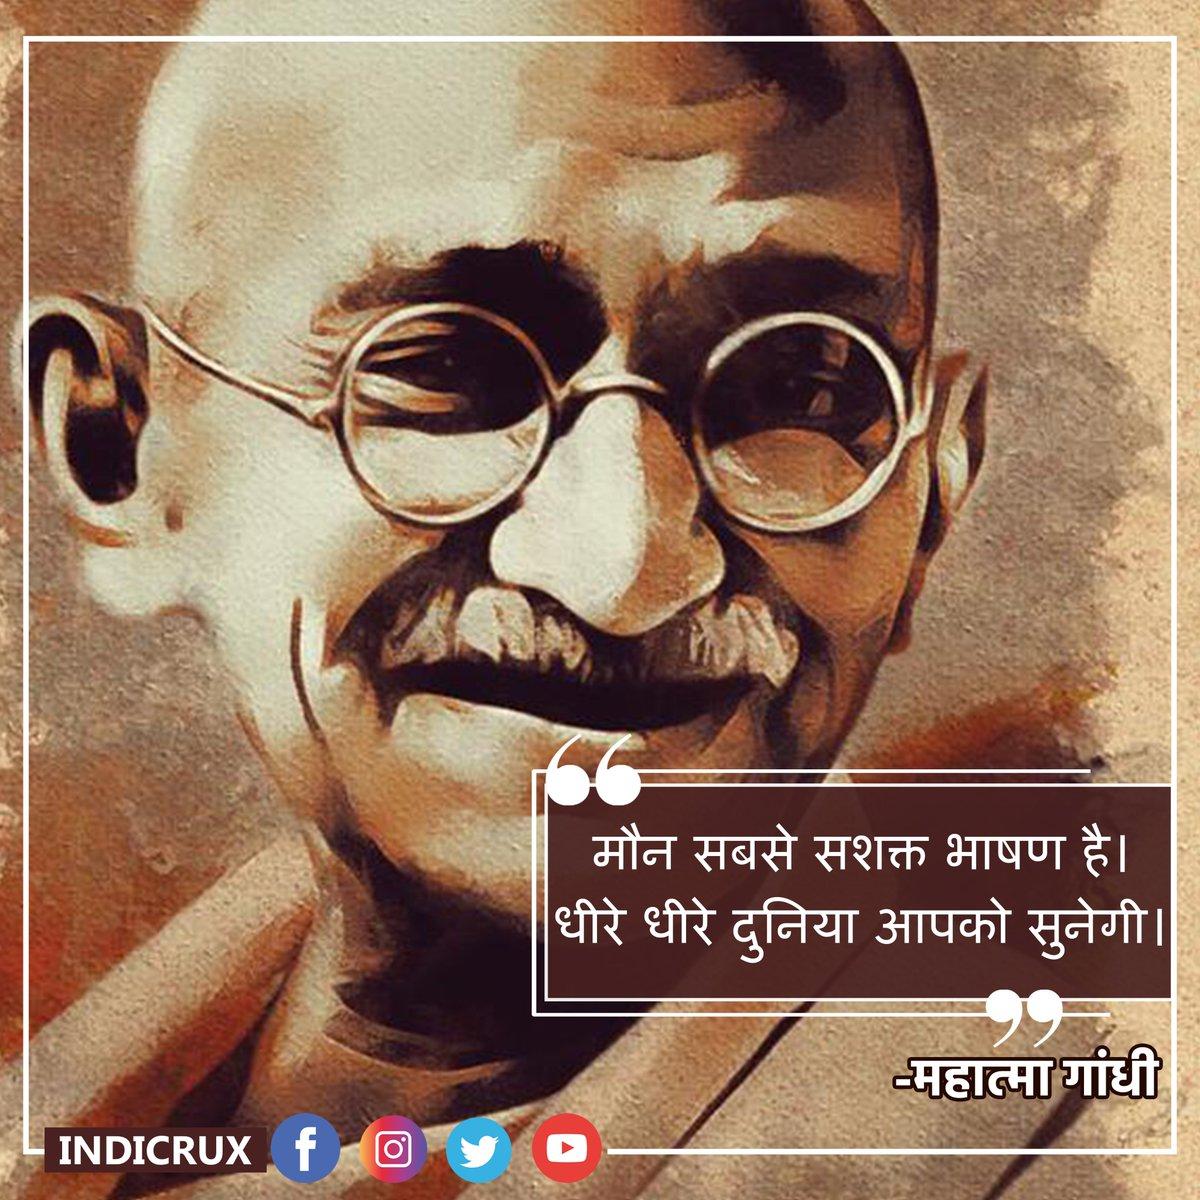 मौन सबसे सशक्त भाषण है। धीरे-धीरे दुनिया आपको सुनेगी। ... #gandhiji #gandhi #mahatmagandhi #india #gandhijayanti #gandhiquotes #freedom #indian #mahatma #fatherofthenation #peace #art #quotes #gandhijayanthi #bapu #fatherofnation #october #nonviolence